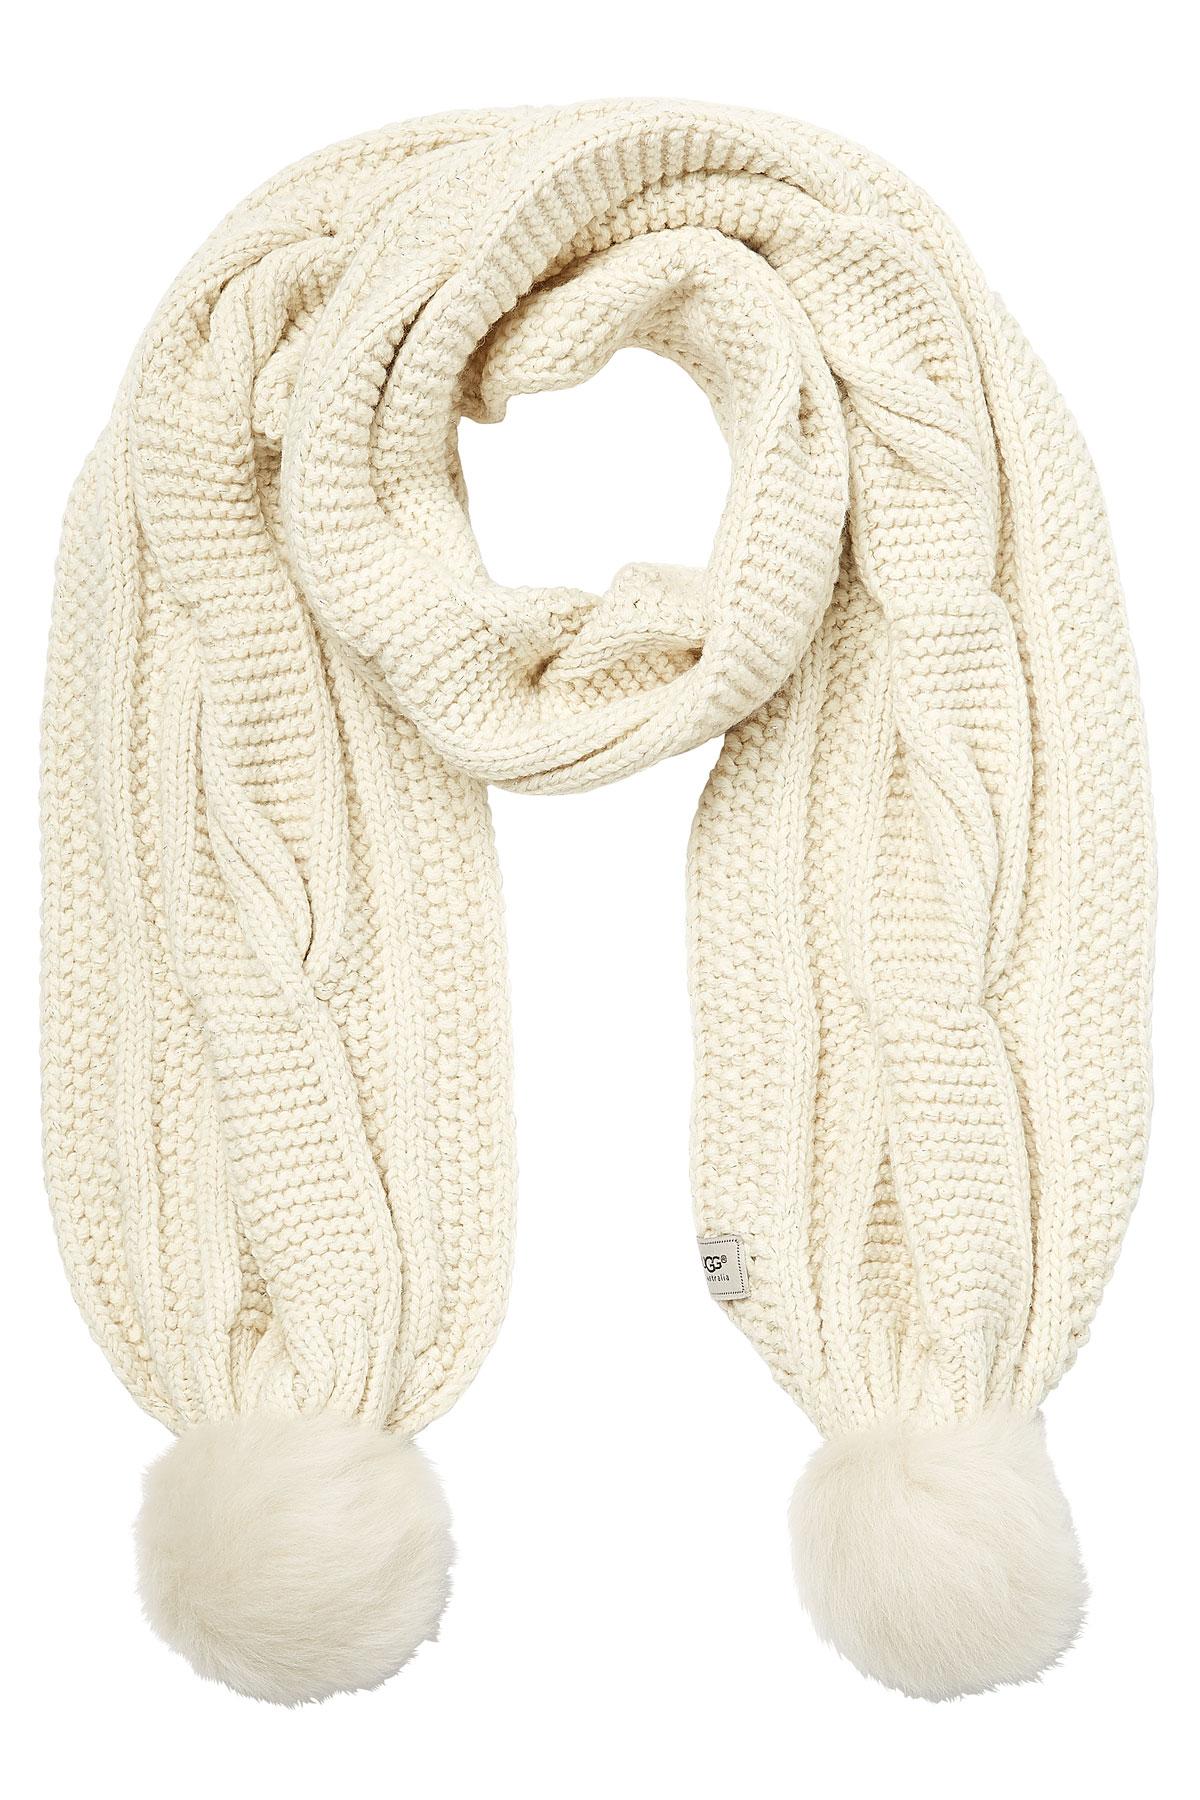 33fc36897 UGG Wool Blend Scarf With Sheepskin Pom-poms - Lyst